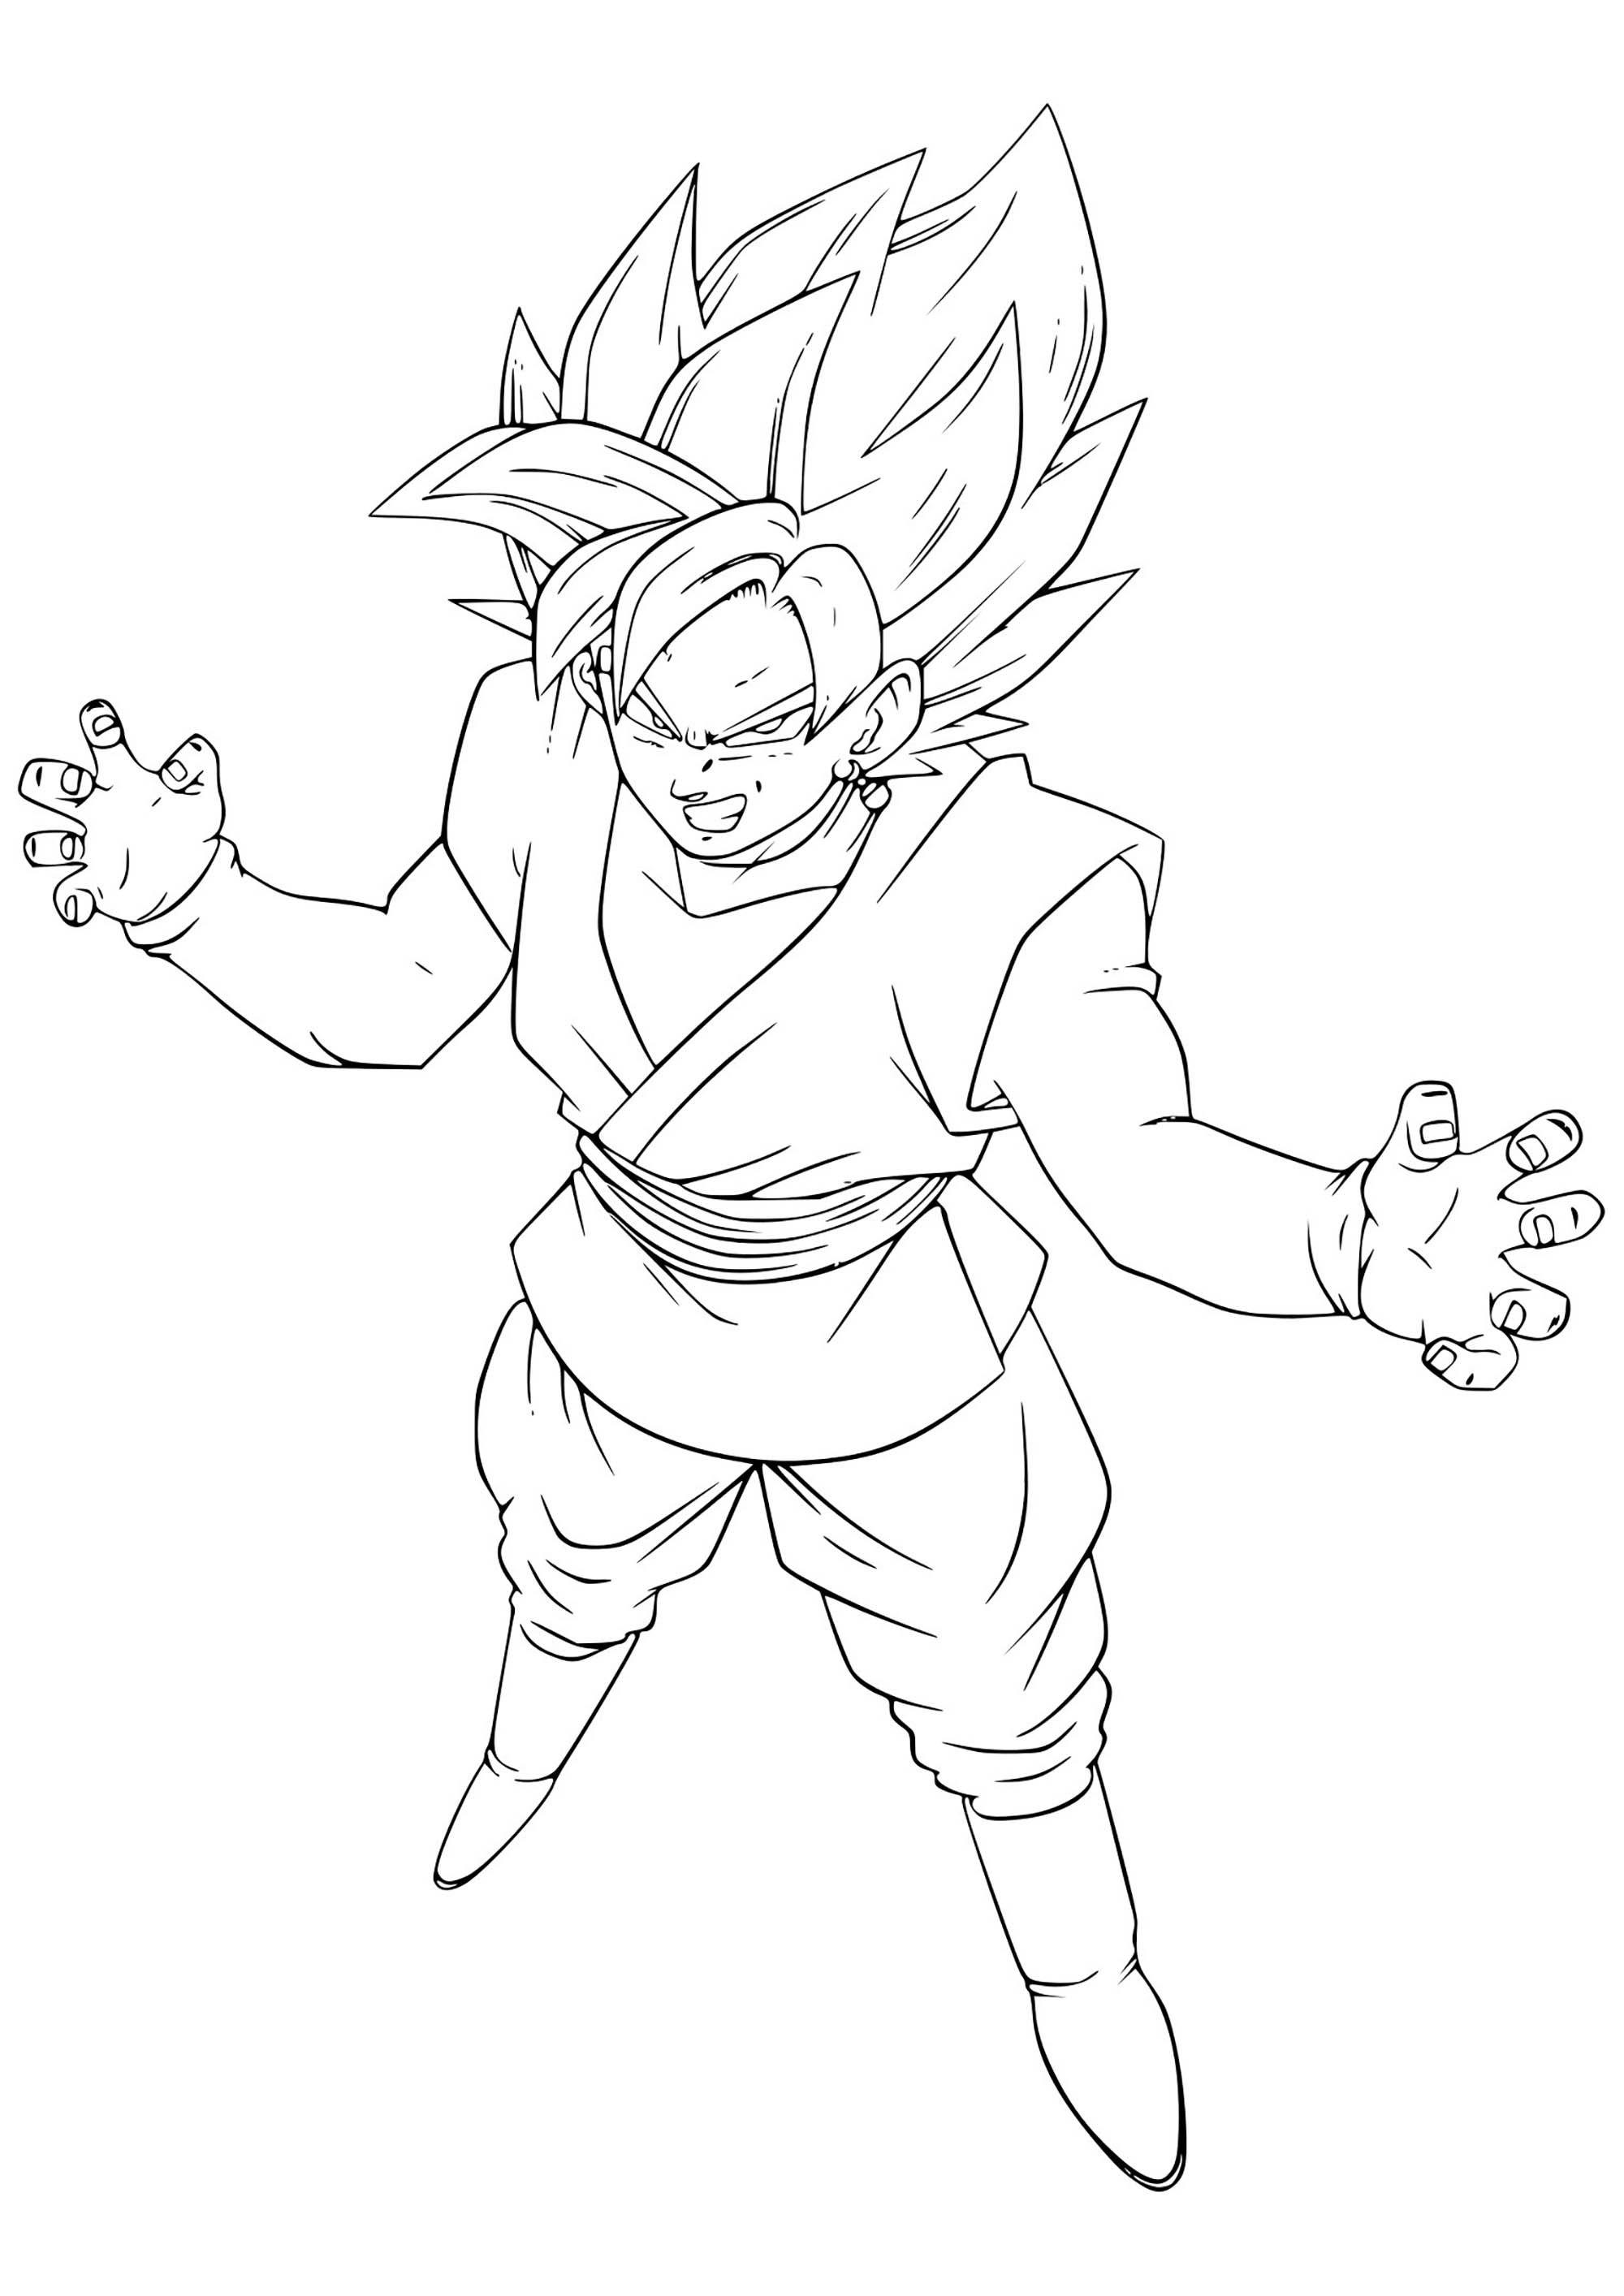 Goku Coloring Pages Coloring Pages Black Pink Goku Dragon